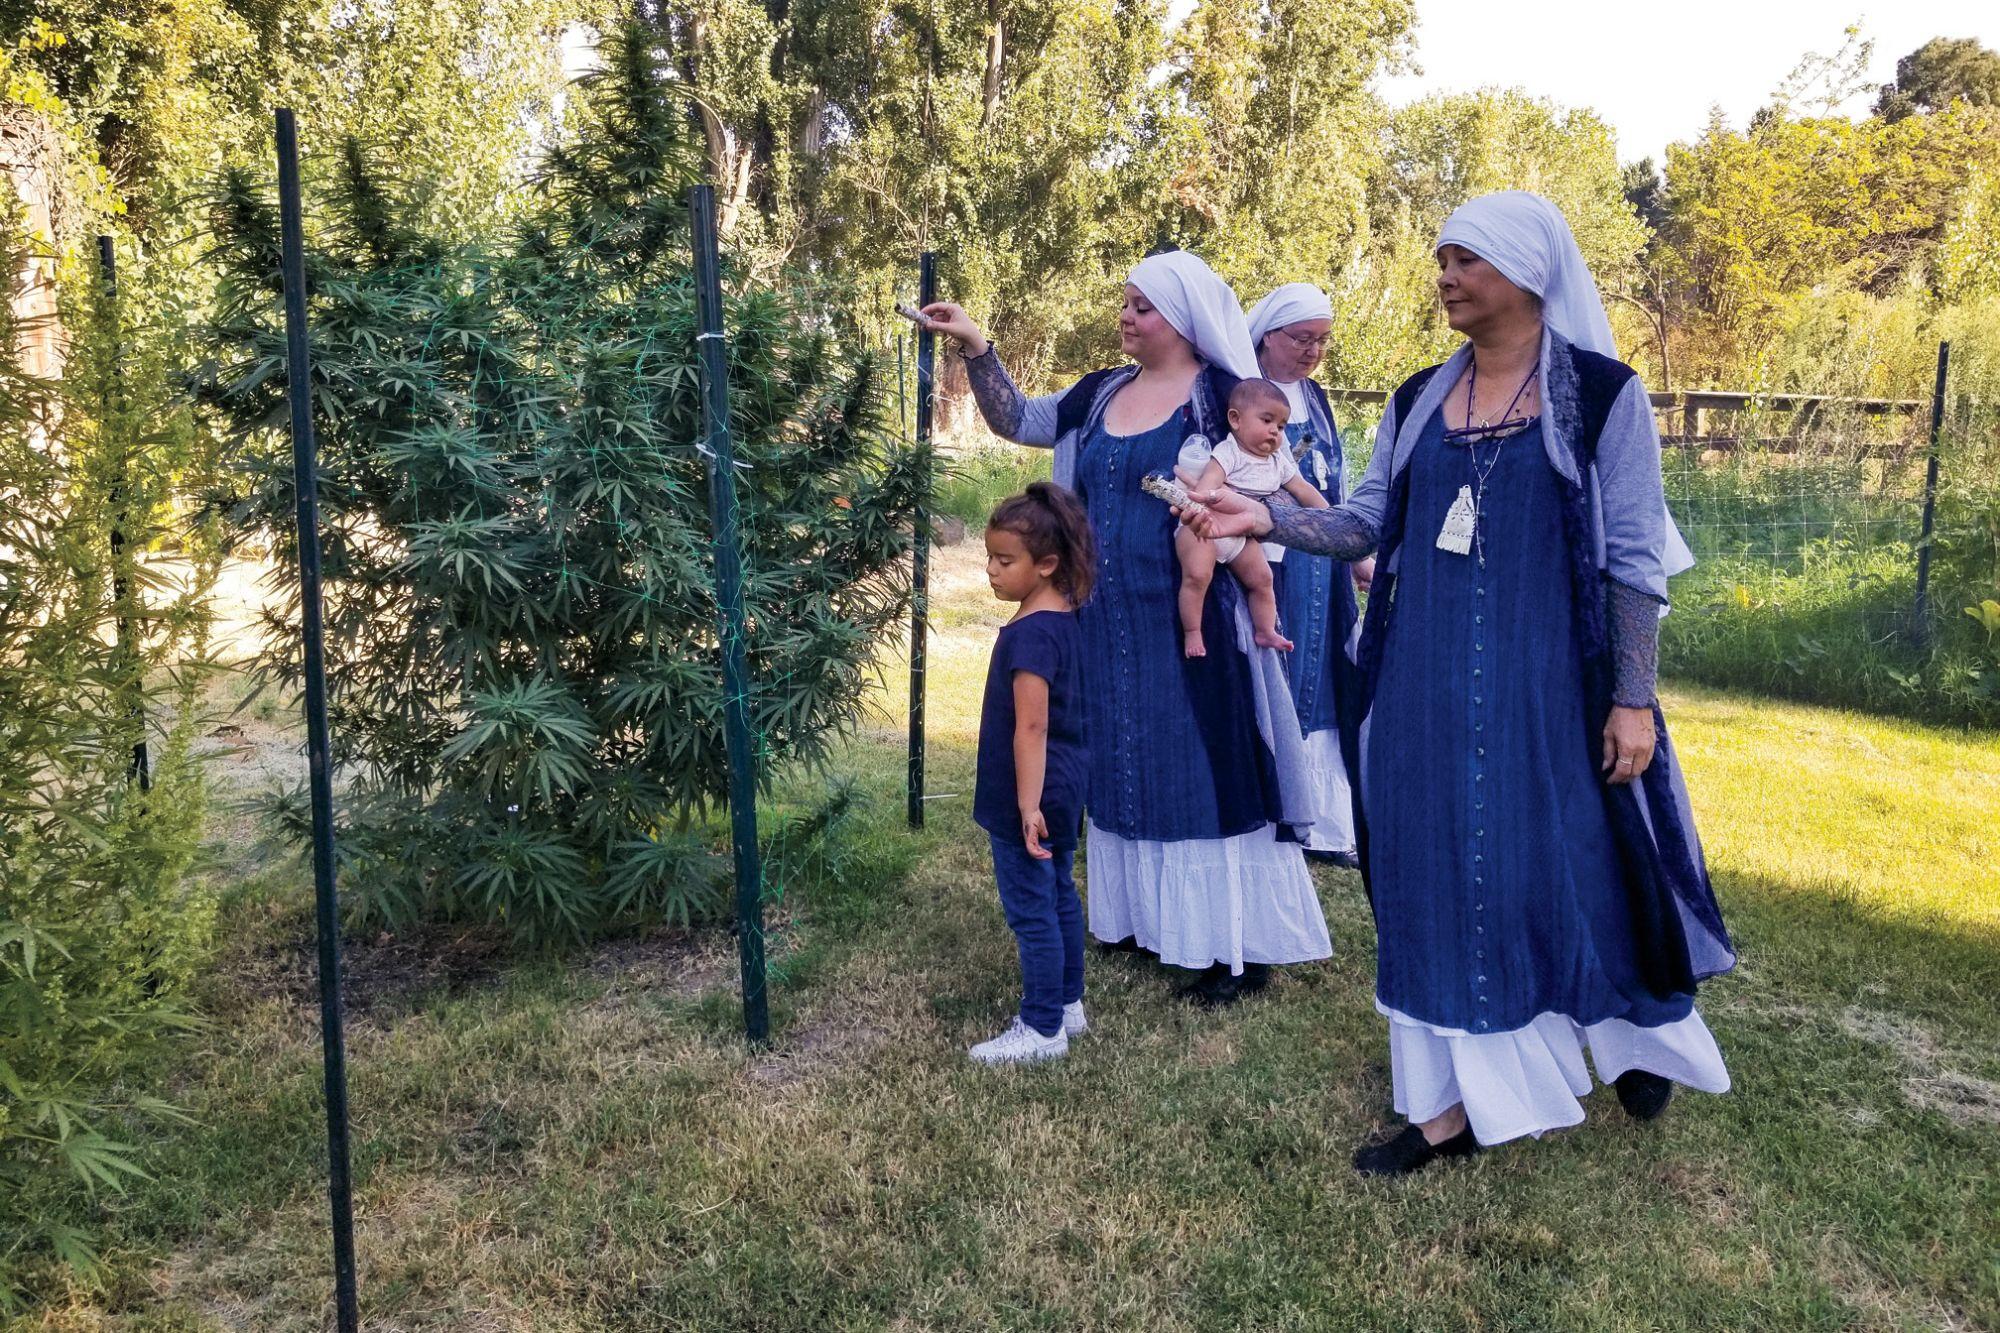 Meet The Nuns Making CBD